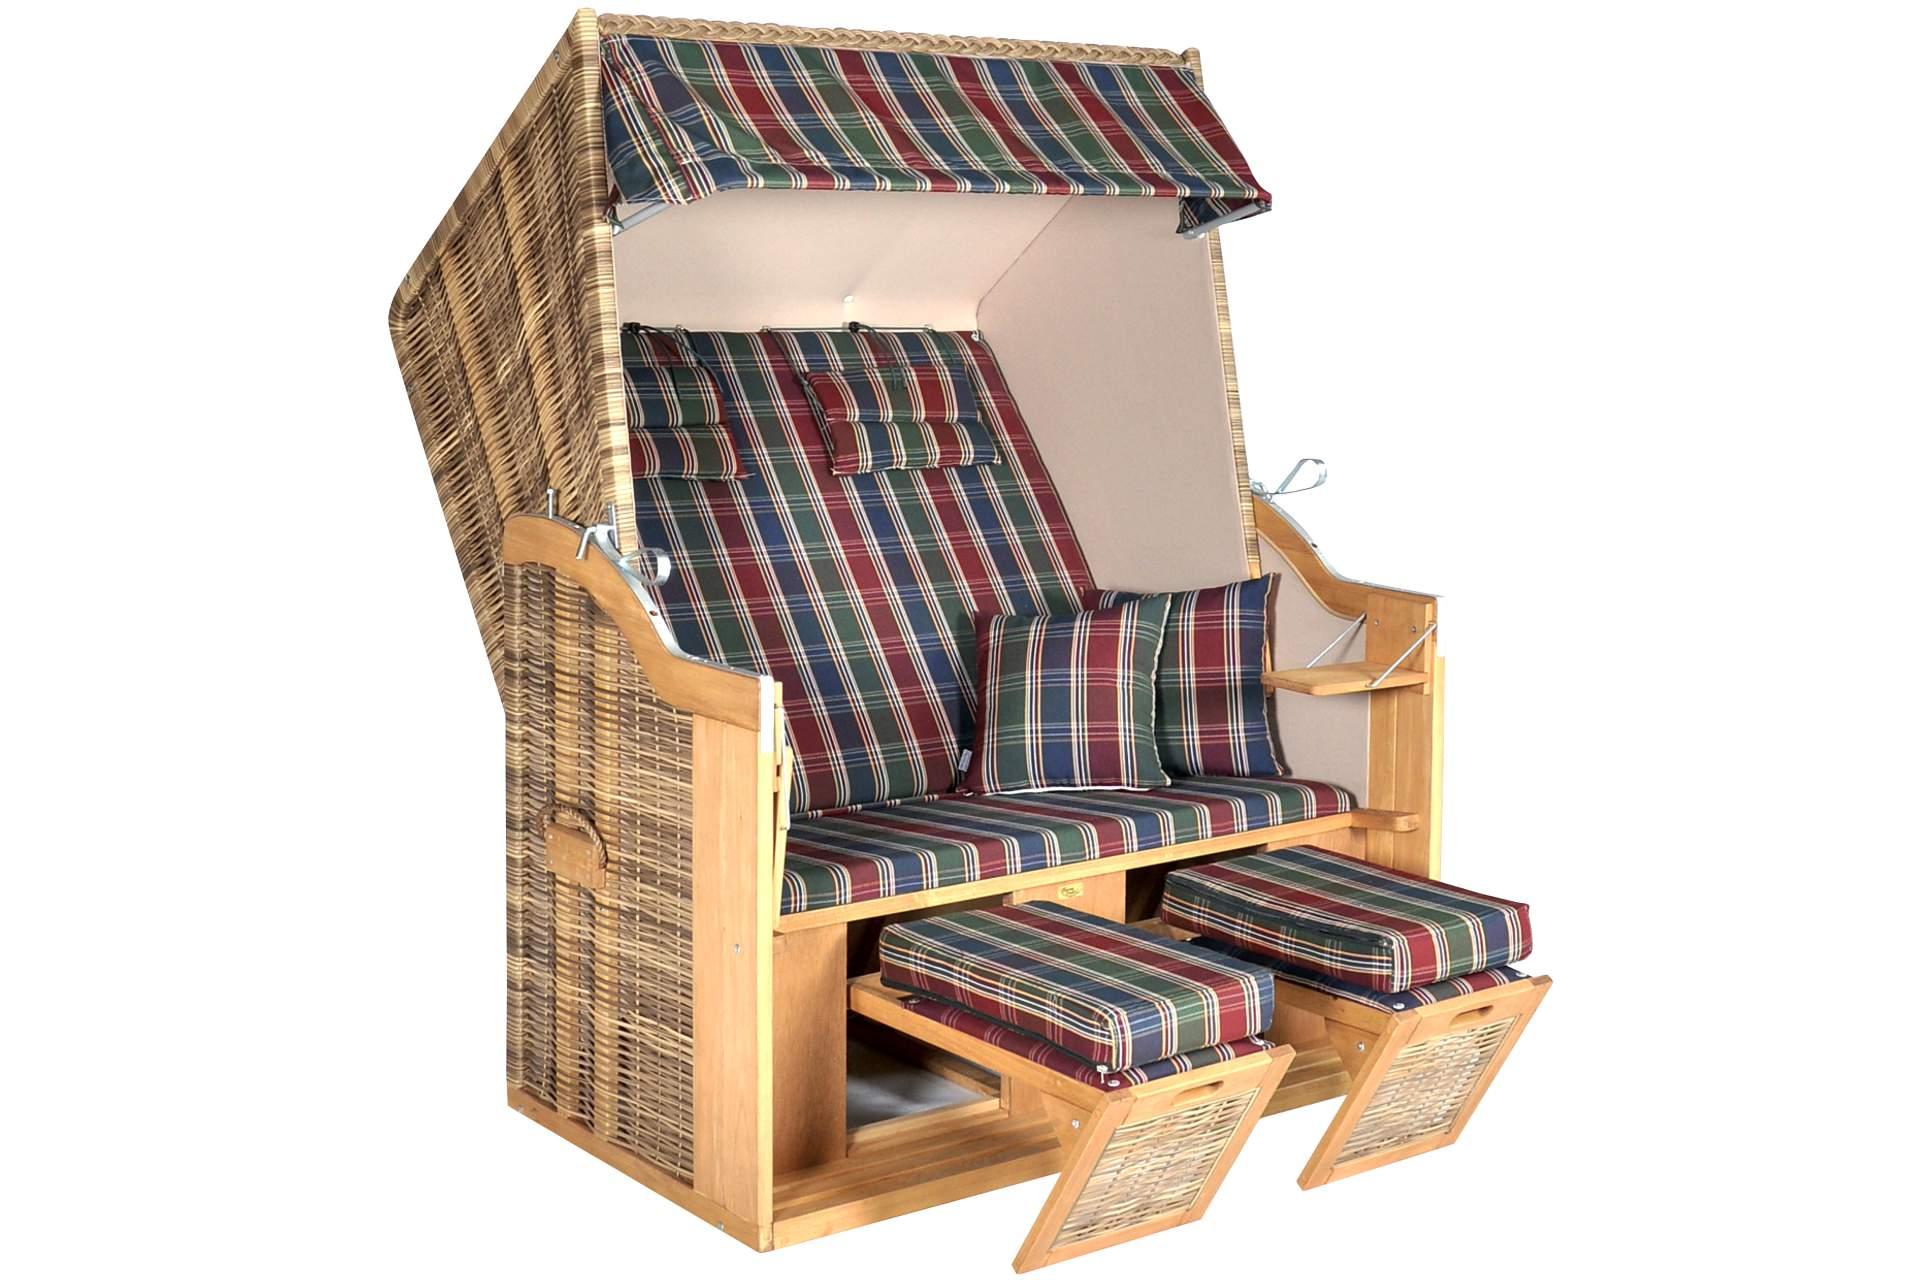 kynast exklusiv. Black Bedroom Furniture Sets. Home Design Ideas